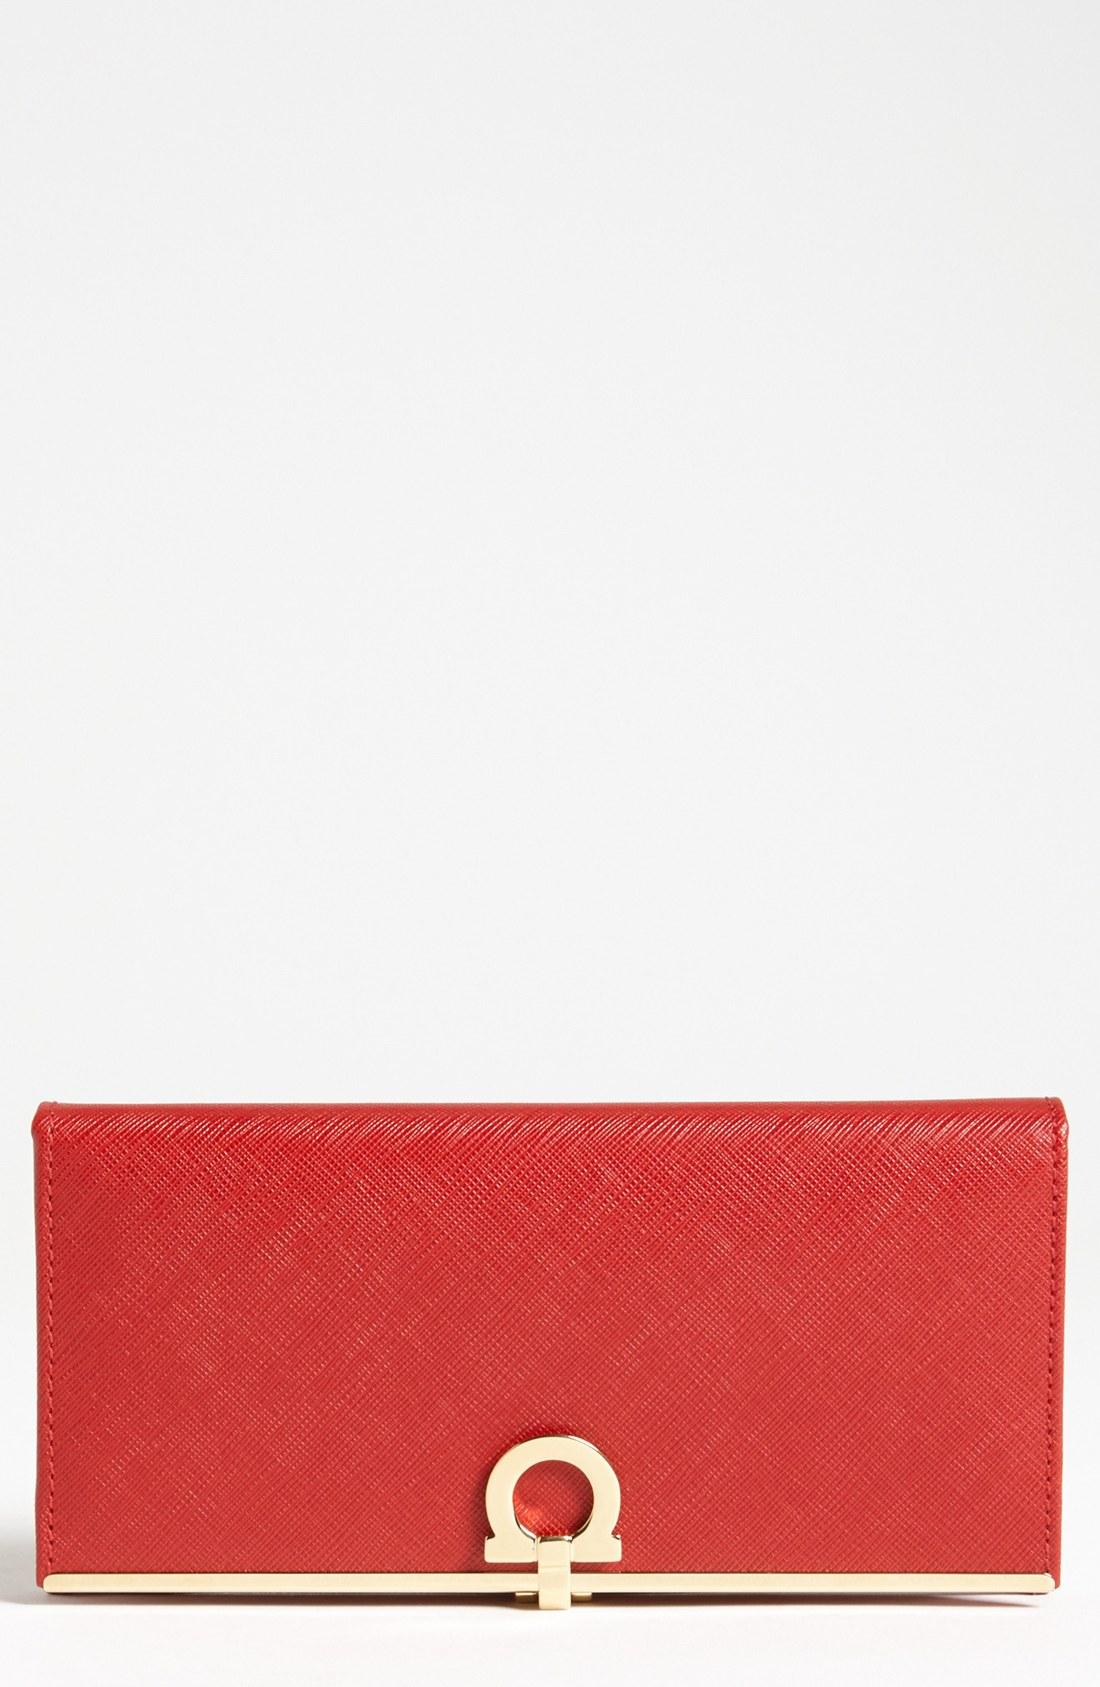 цена бумажник FERRAGAMO  658790 онлайн в 2017 году